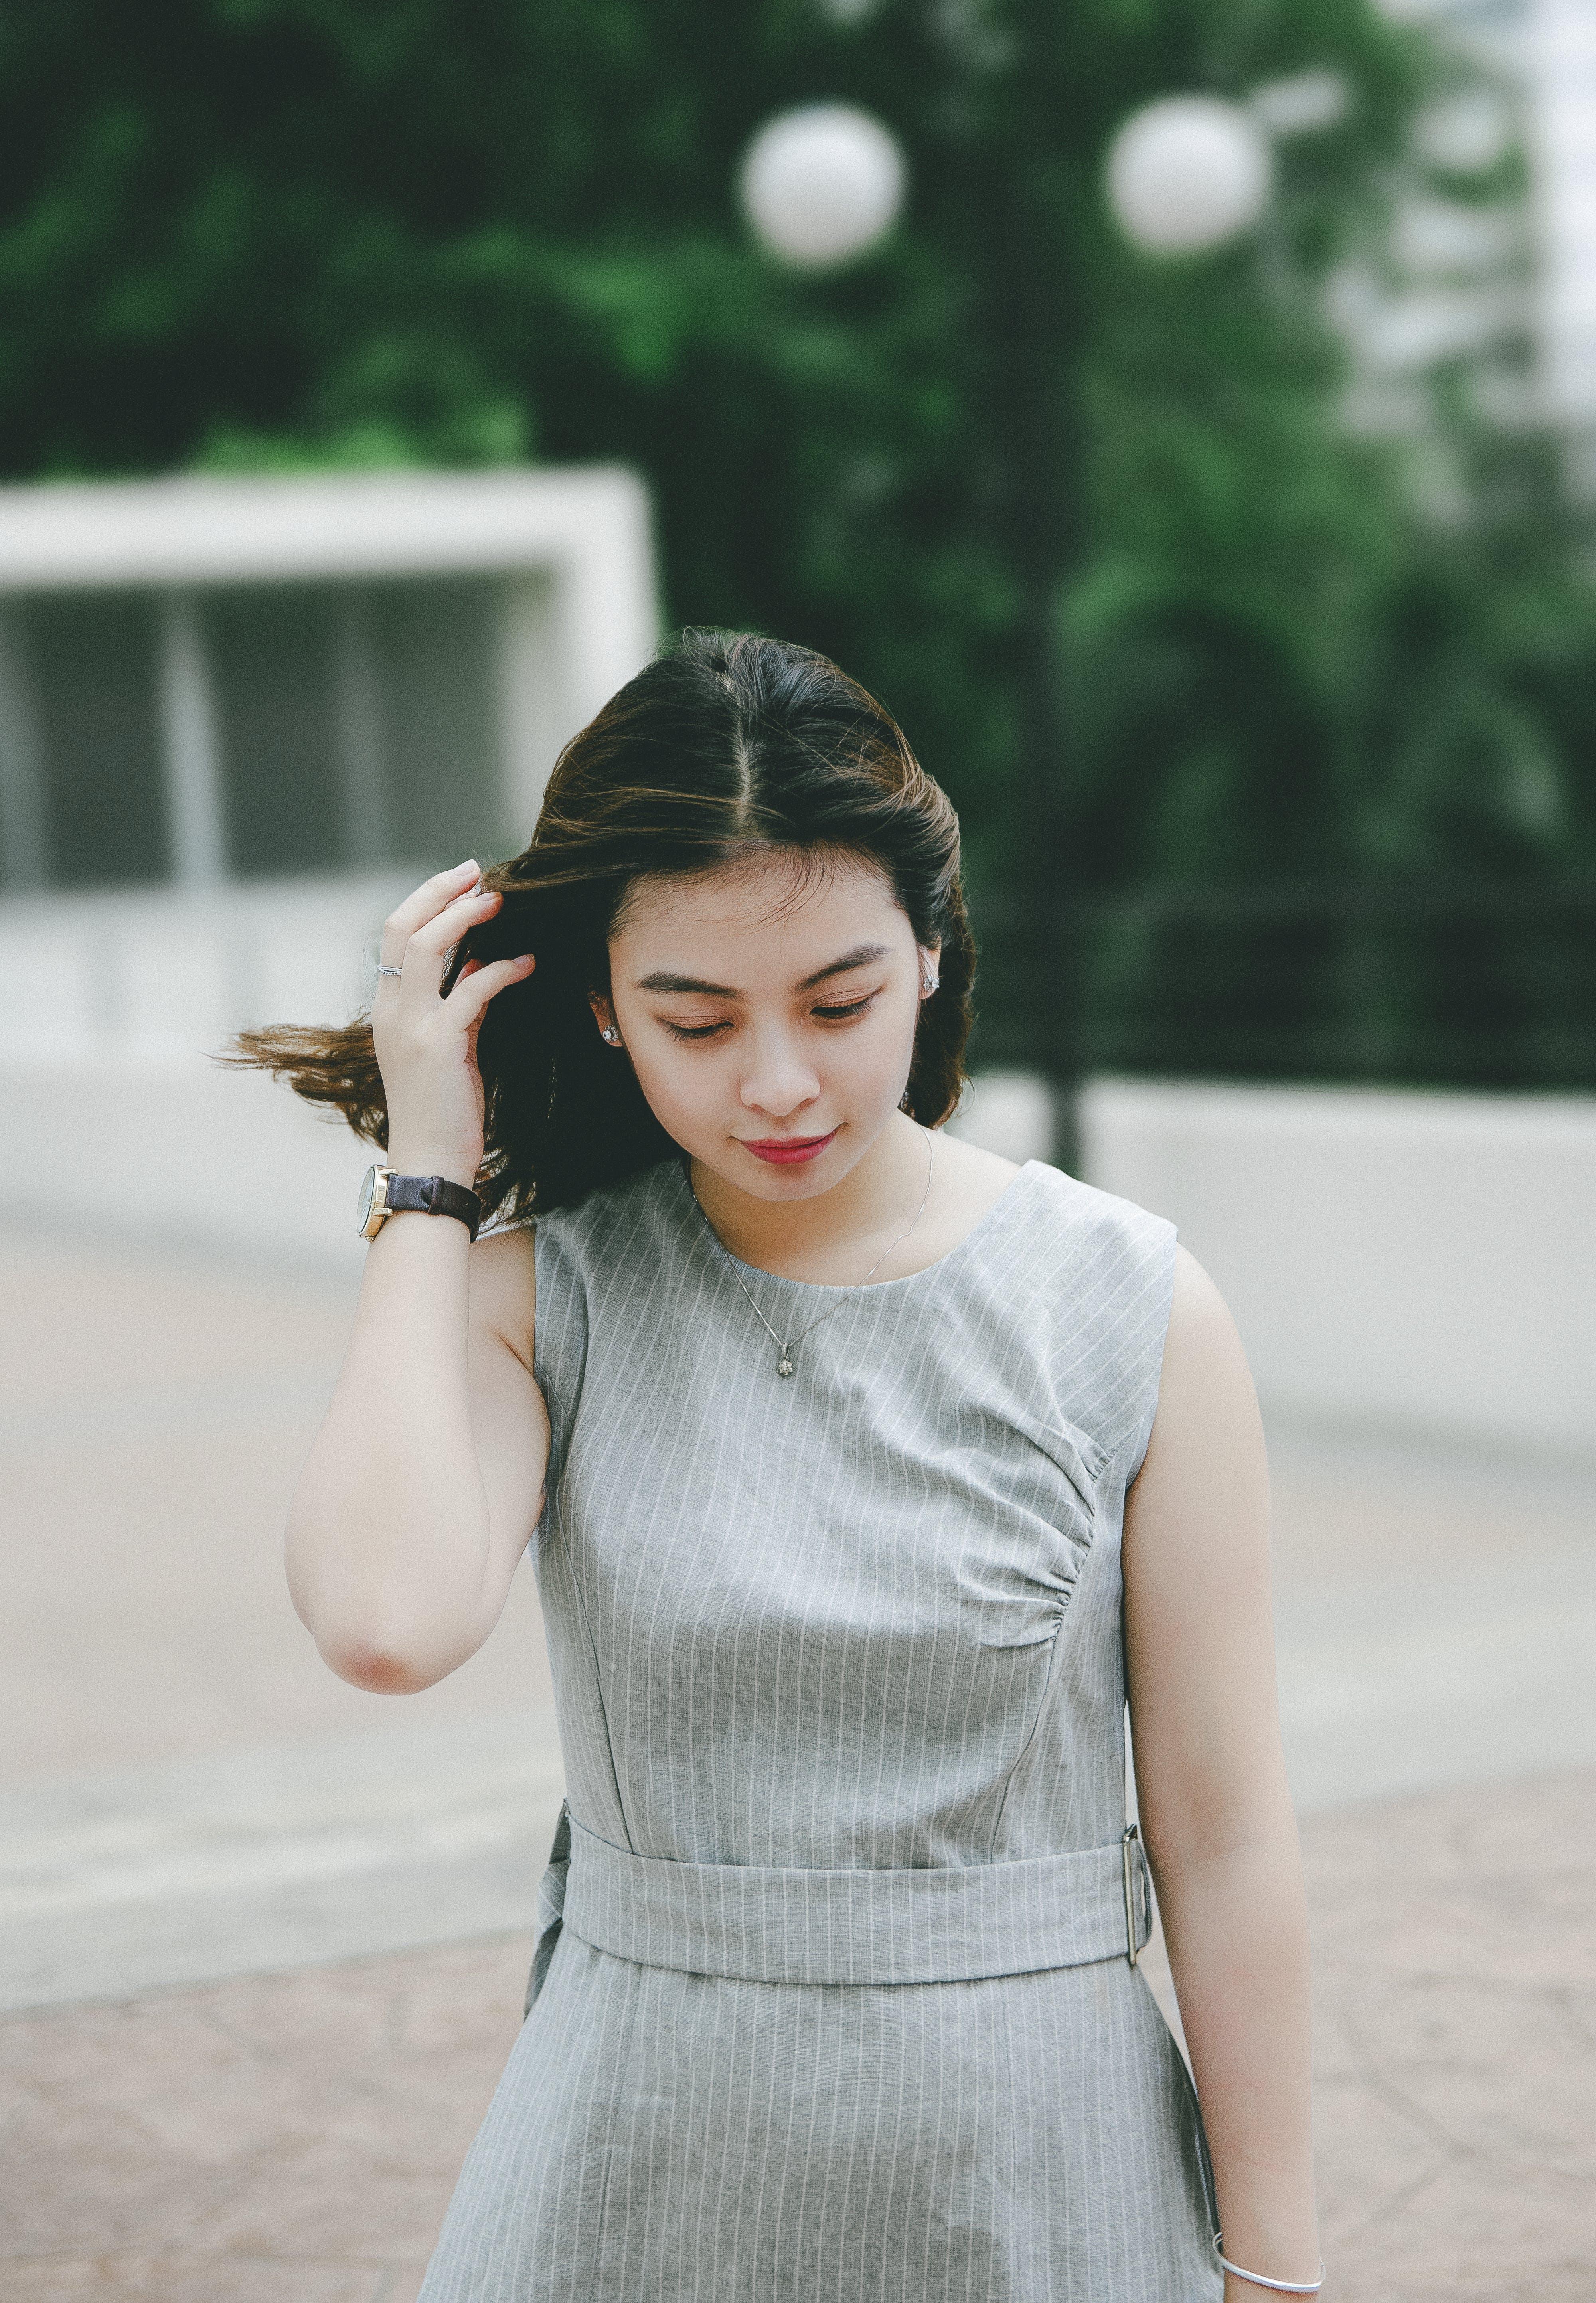 Kostenloses Stock Foto zu asiatin, asiatische frau, fashion, frau